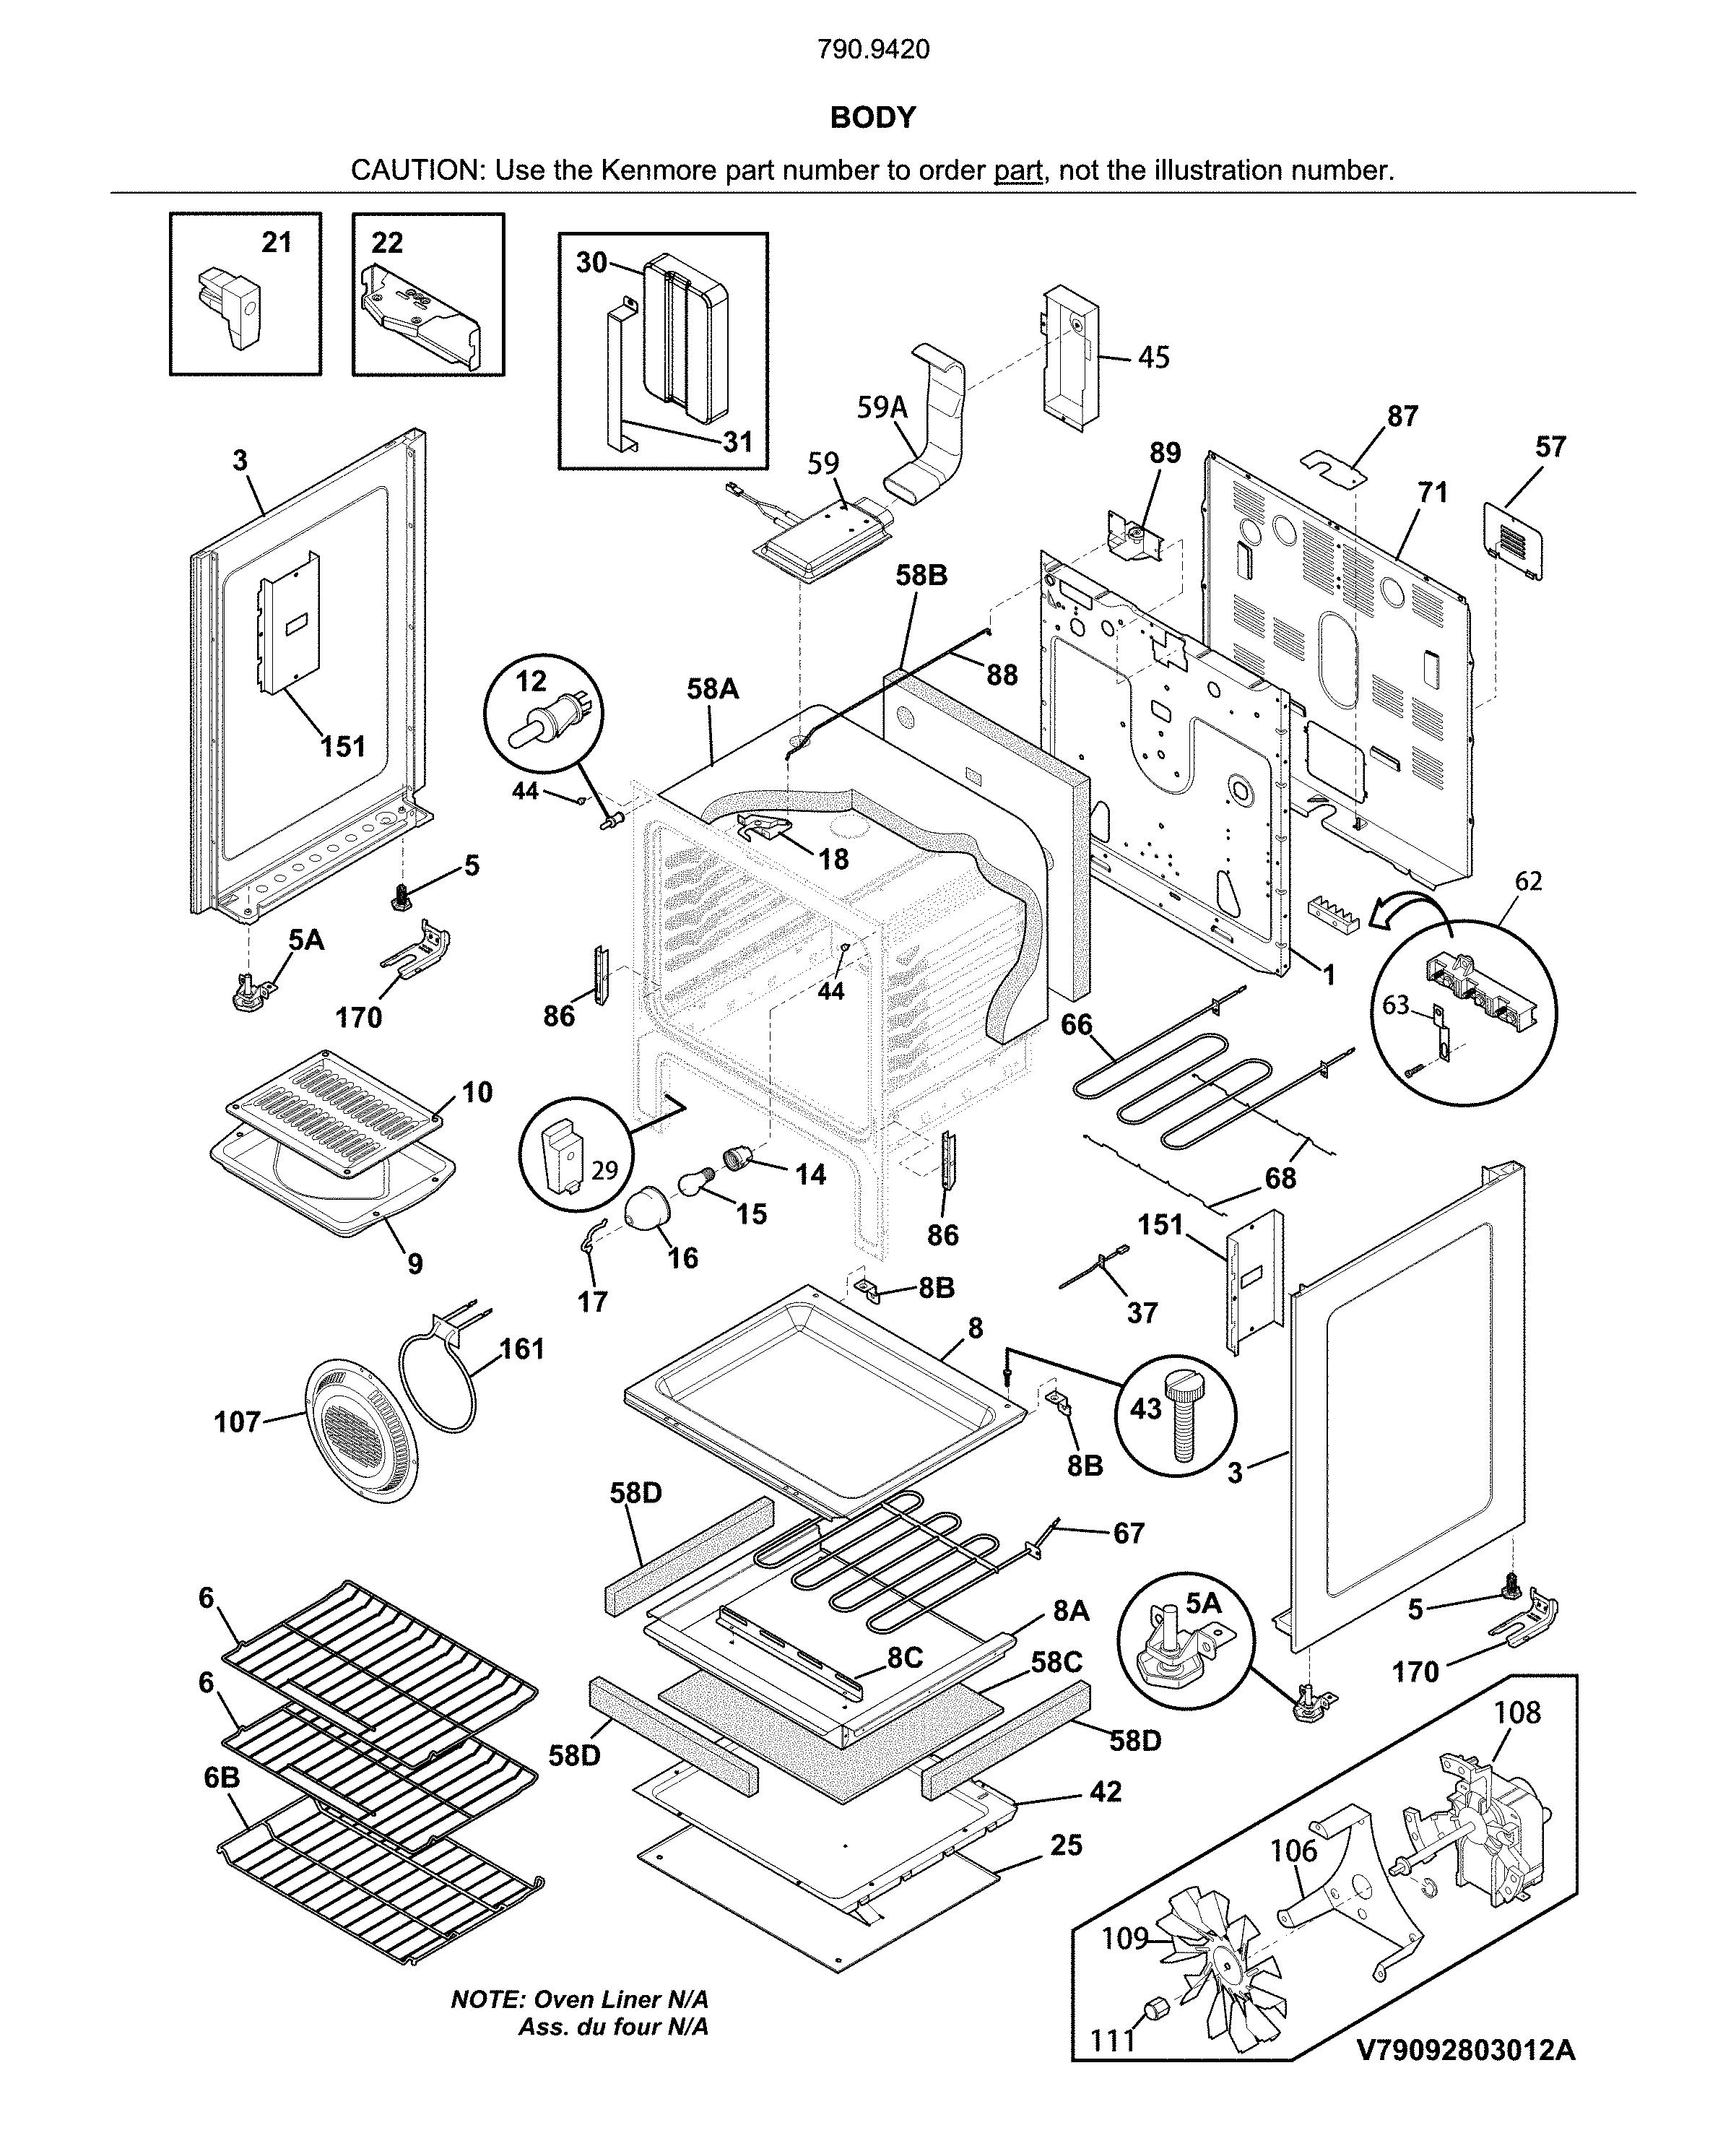 Kenmore  Electric Range  Body